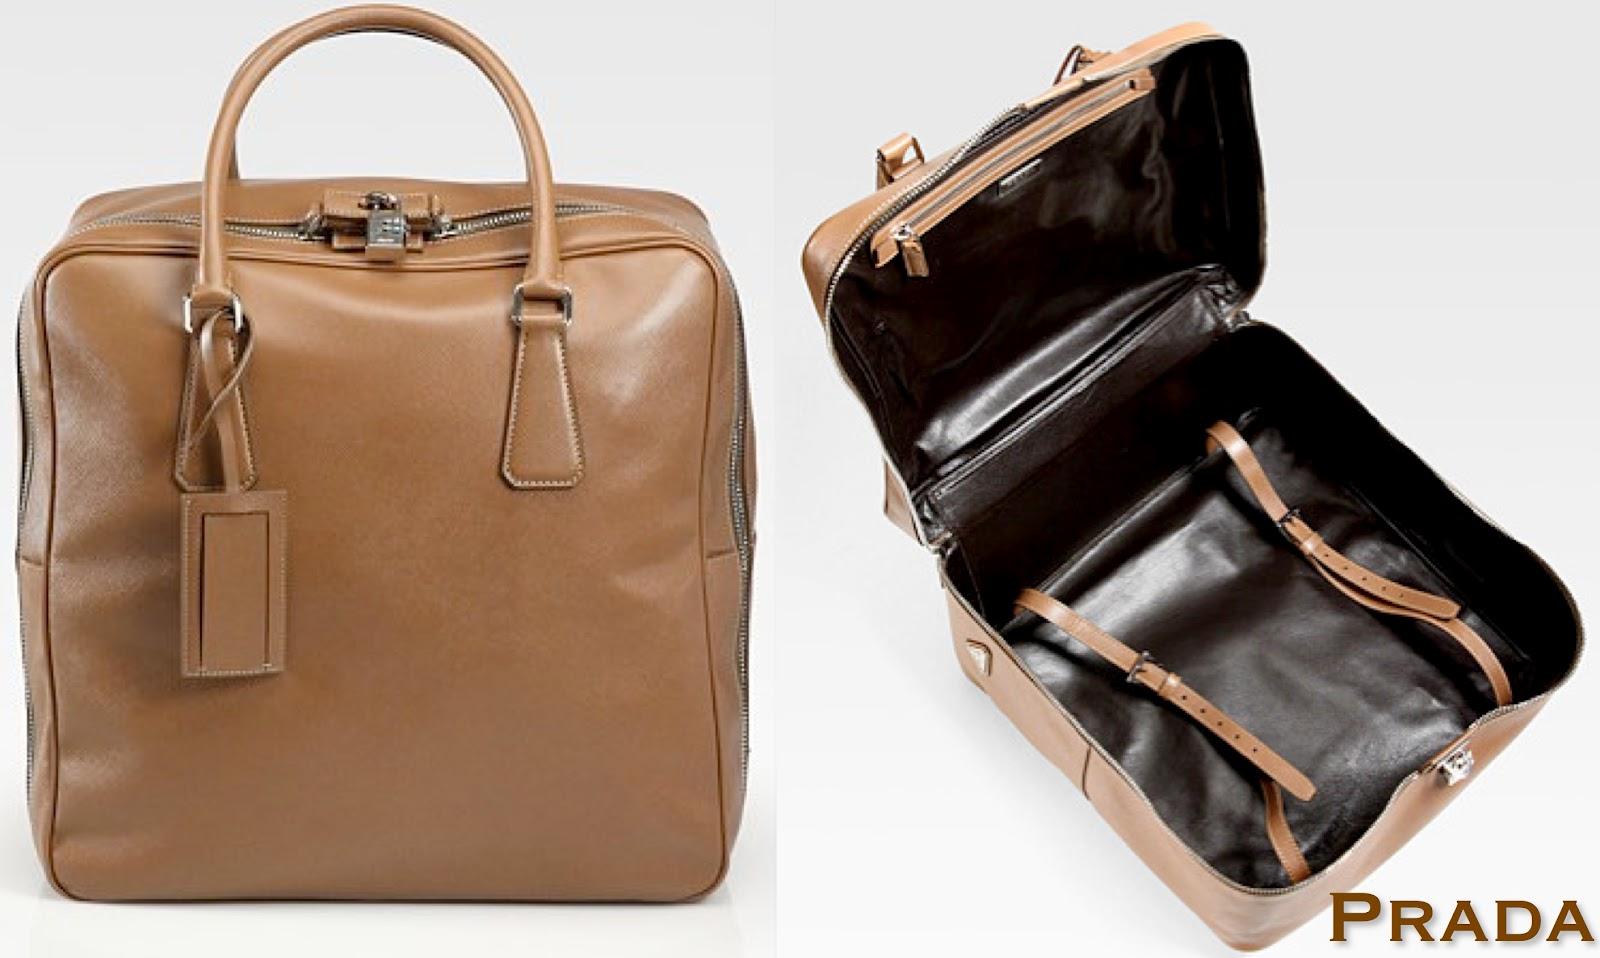 prada tote bags leather